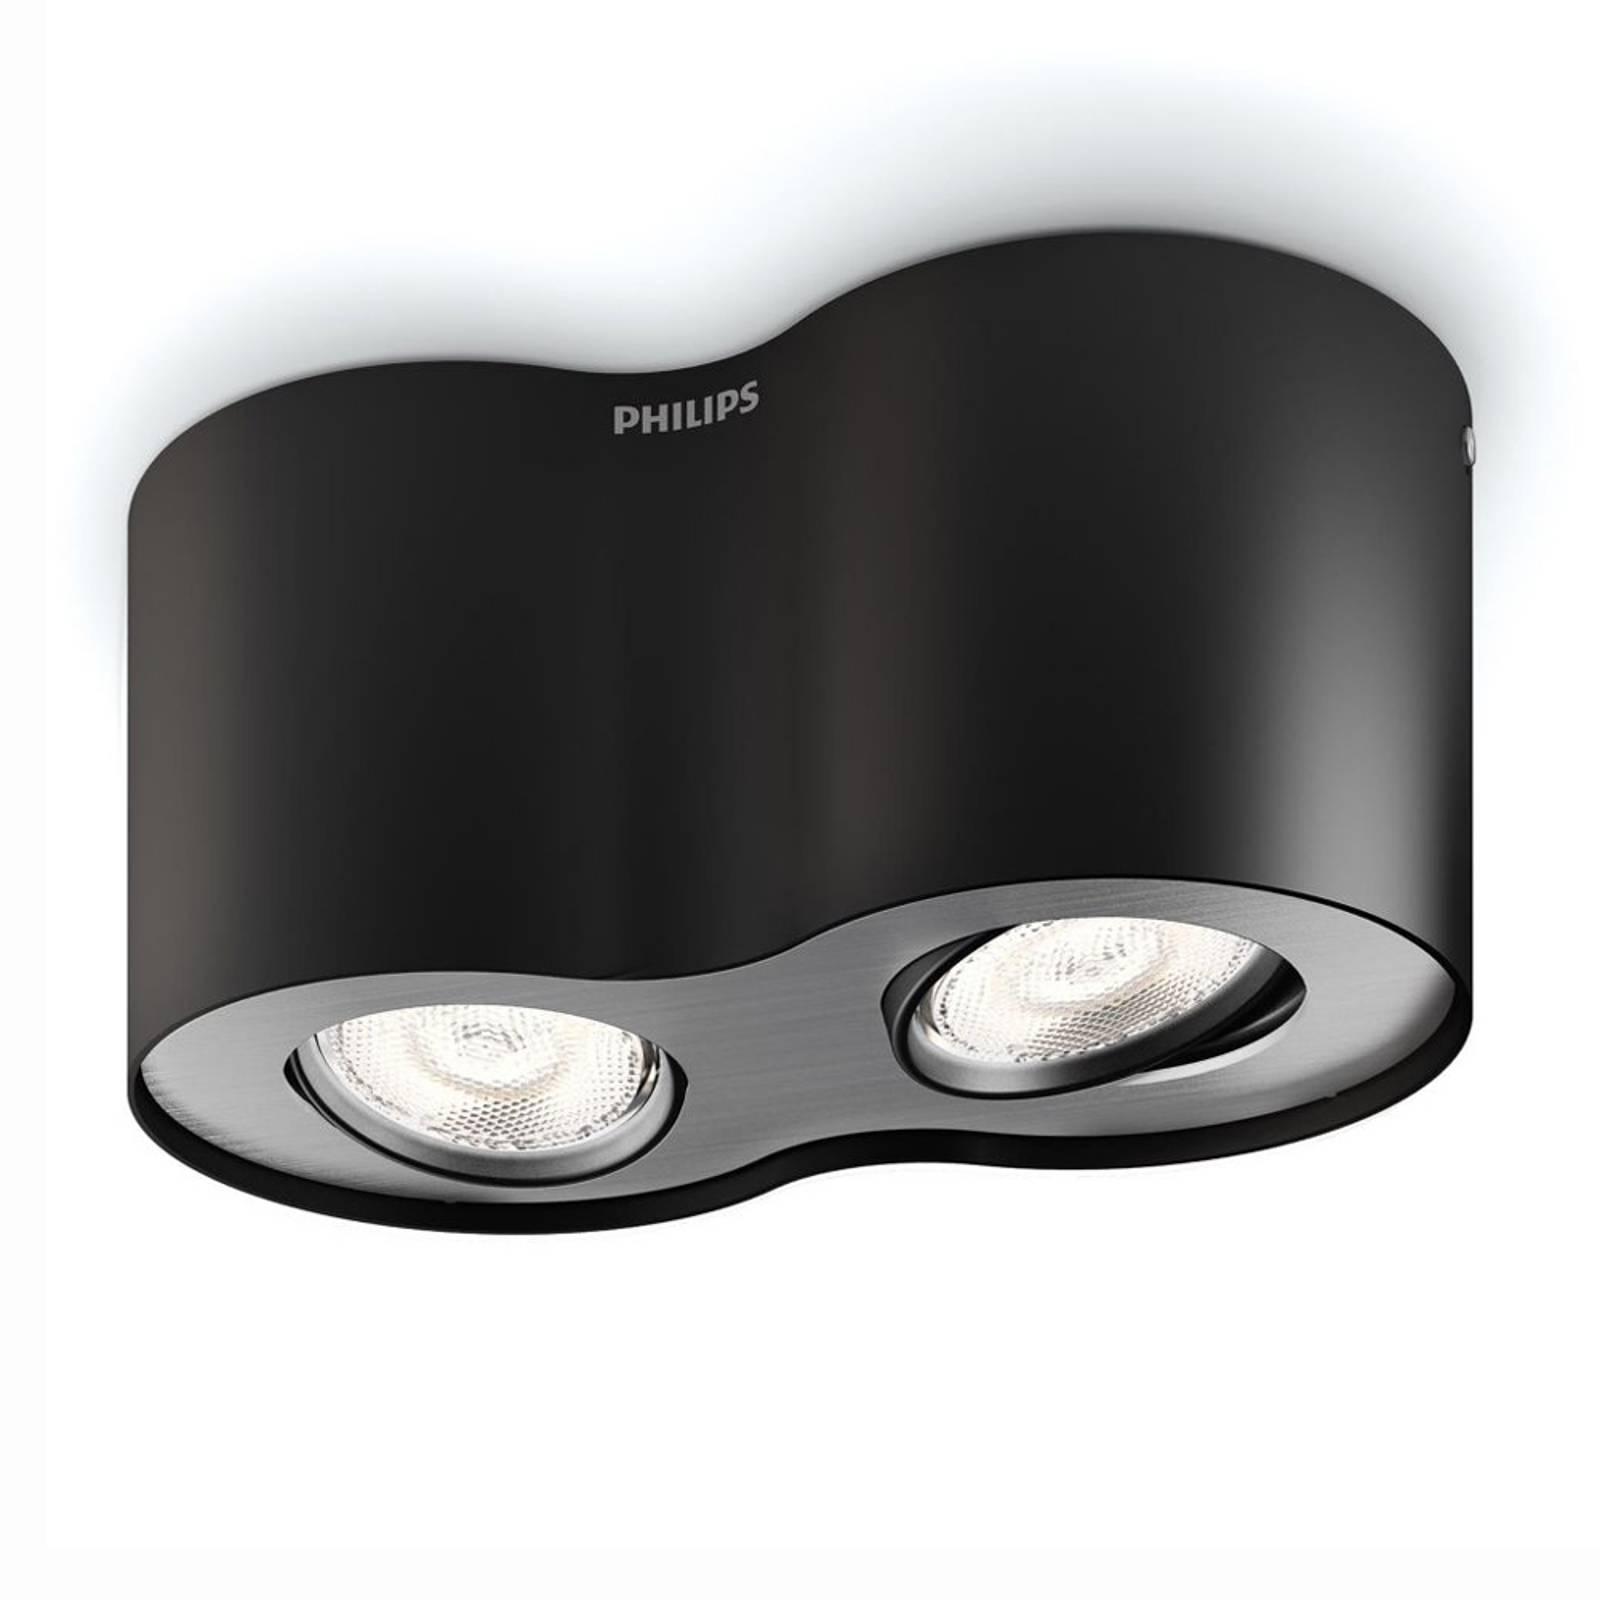 Phase – musta LED-kohdevalaisin, kaksilamppuinen